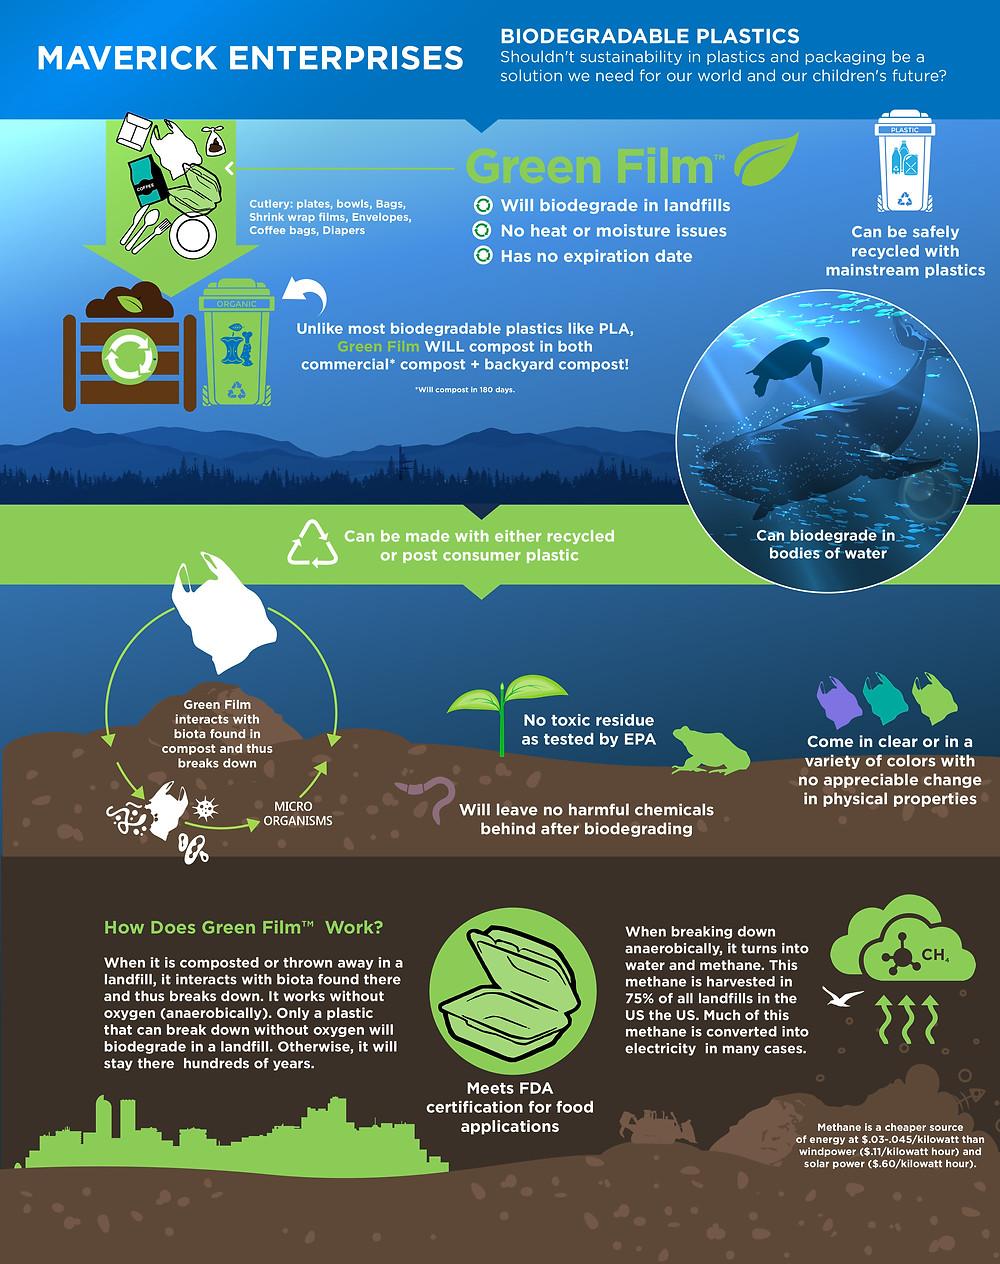 Infographic Illustrator - Infographic for Biodegradable Plastics made by Maverick Enterprises